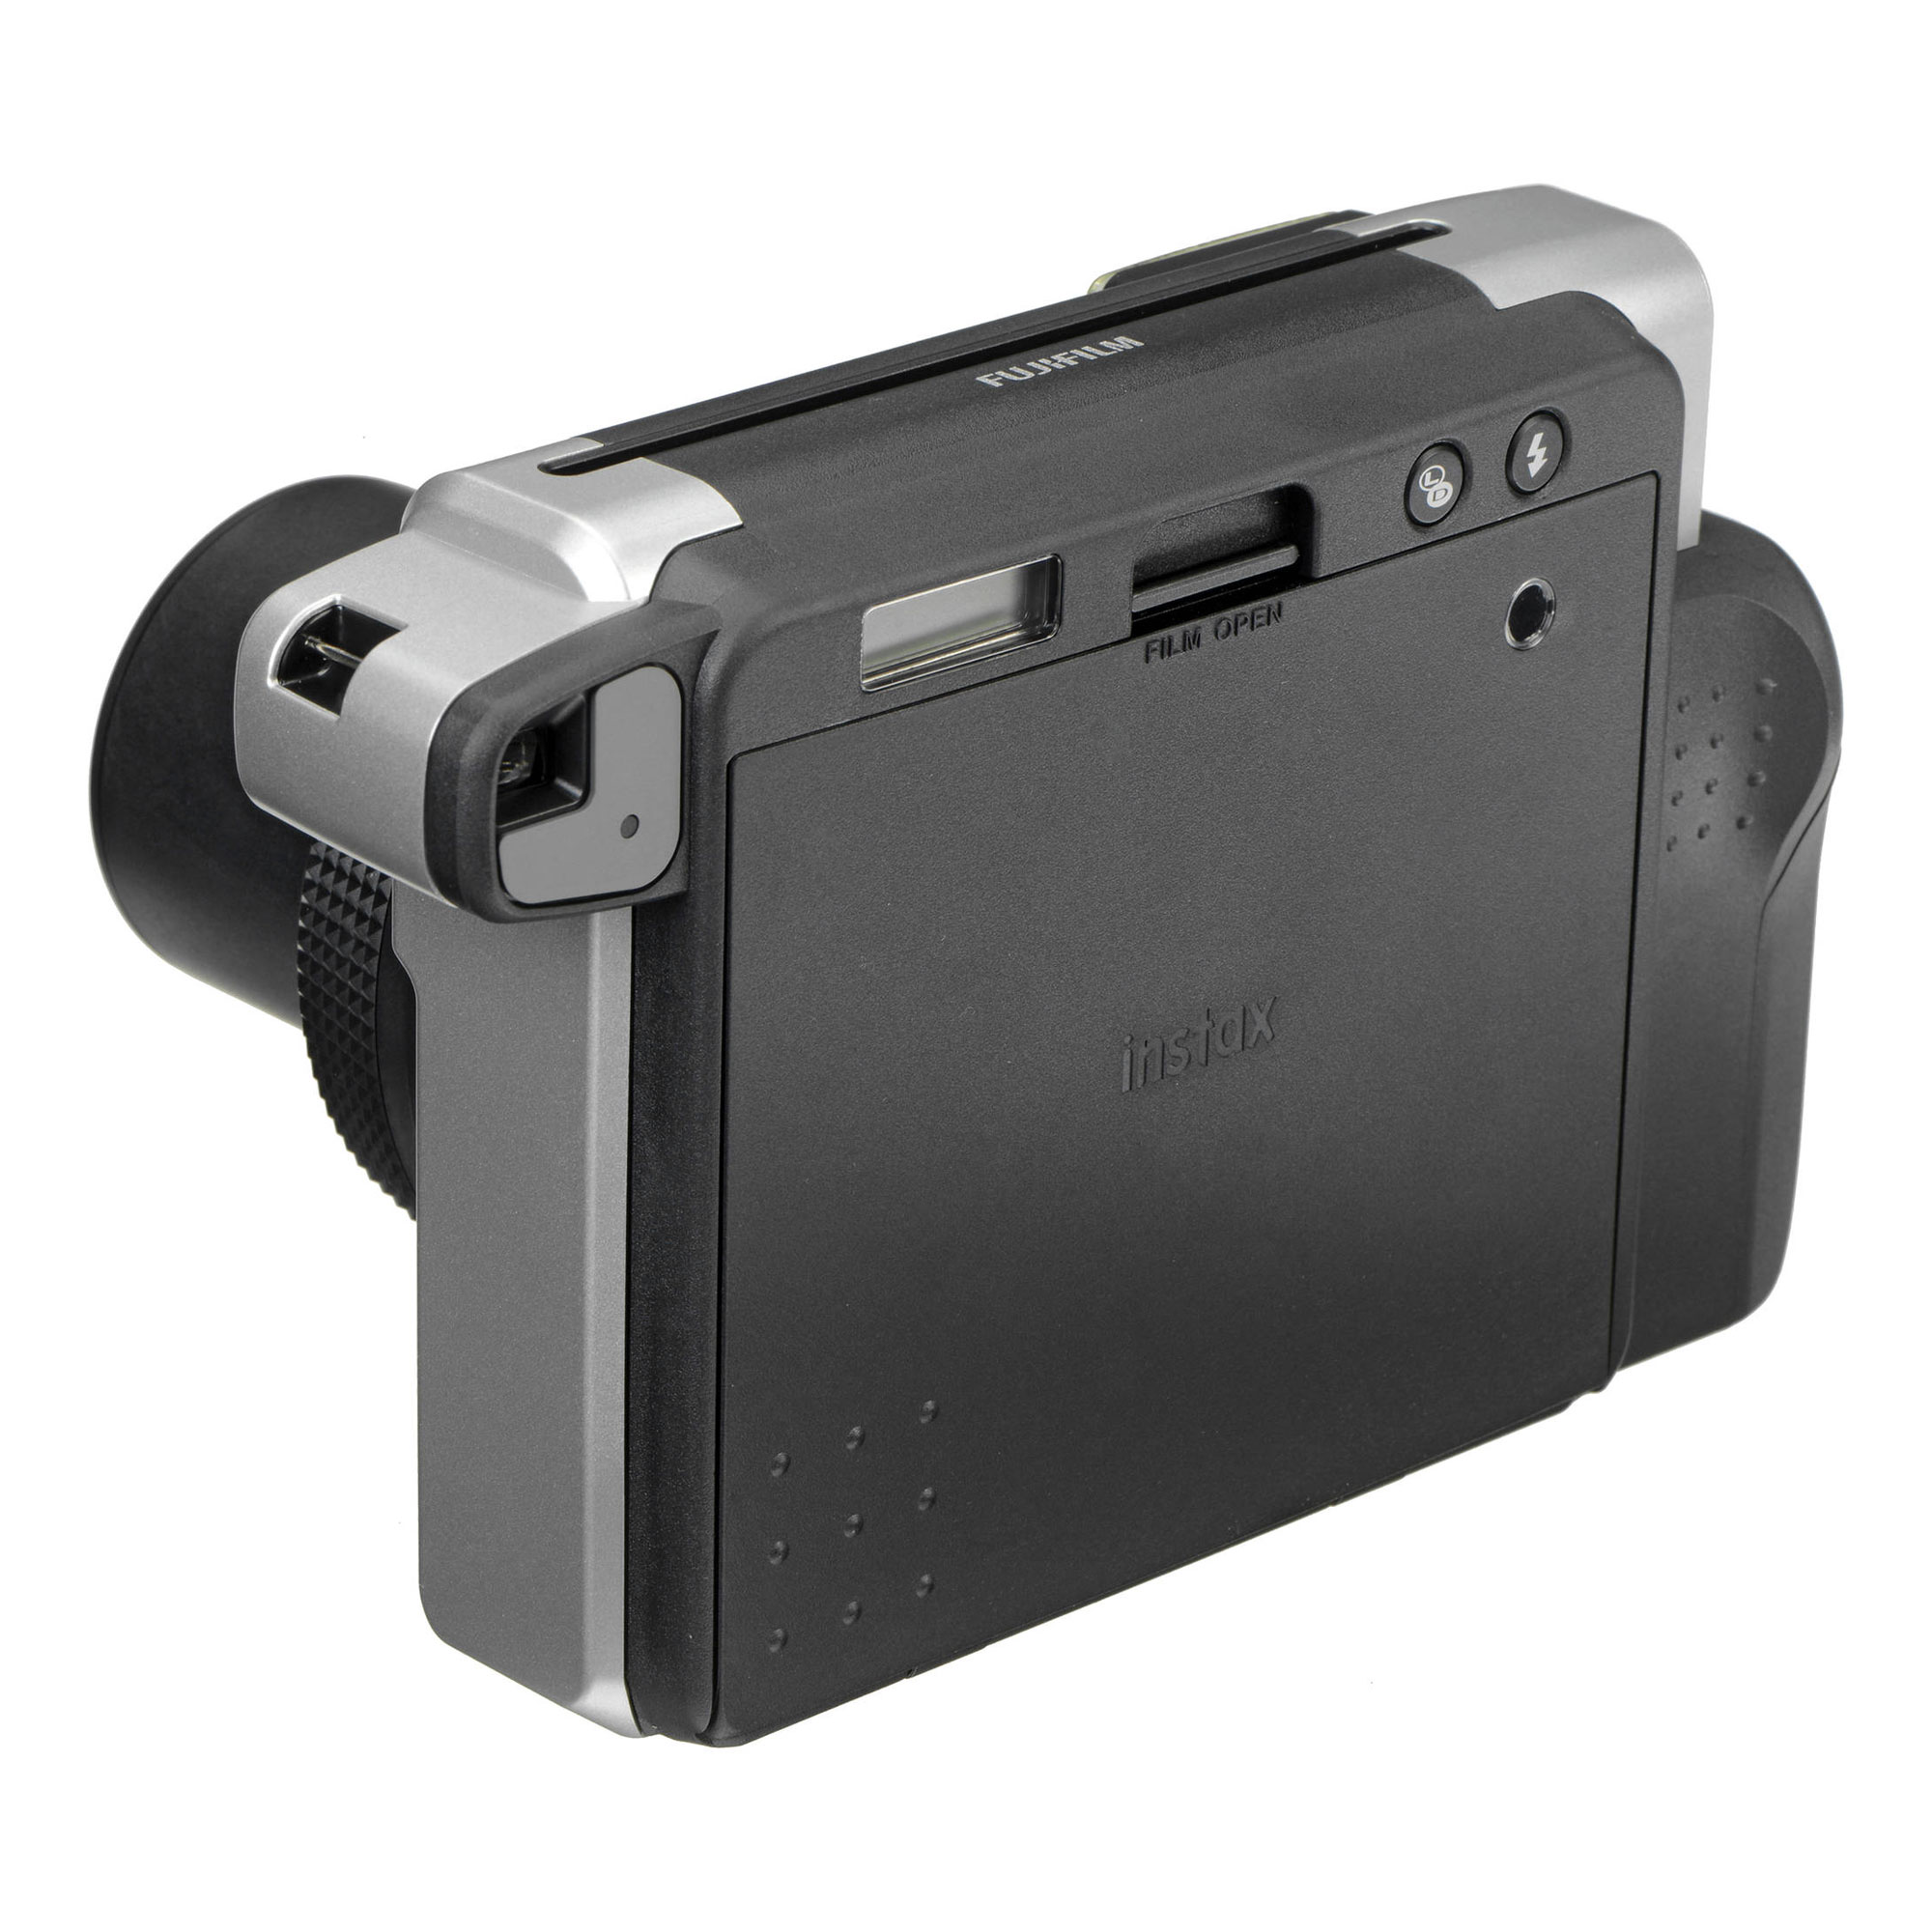 INSTAX Wide 300 Instant Film Camera